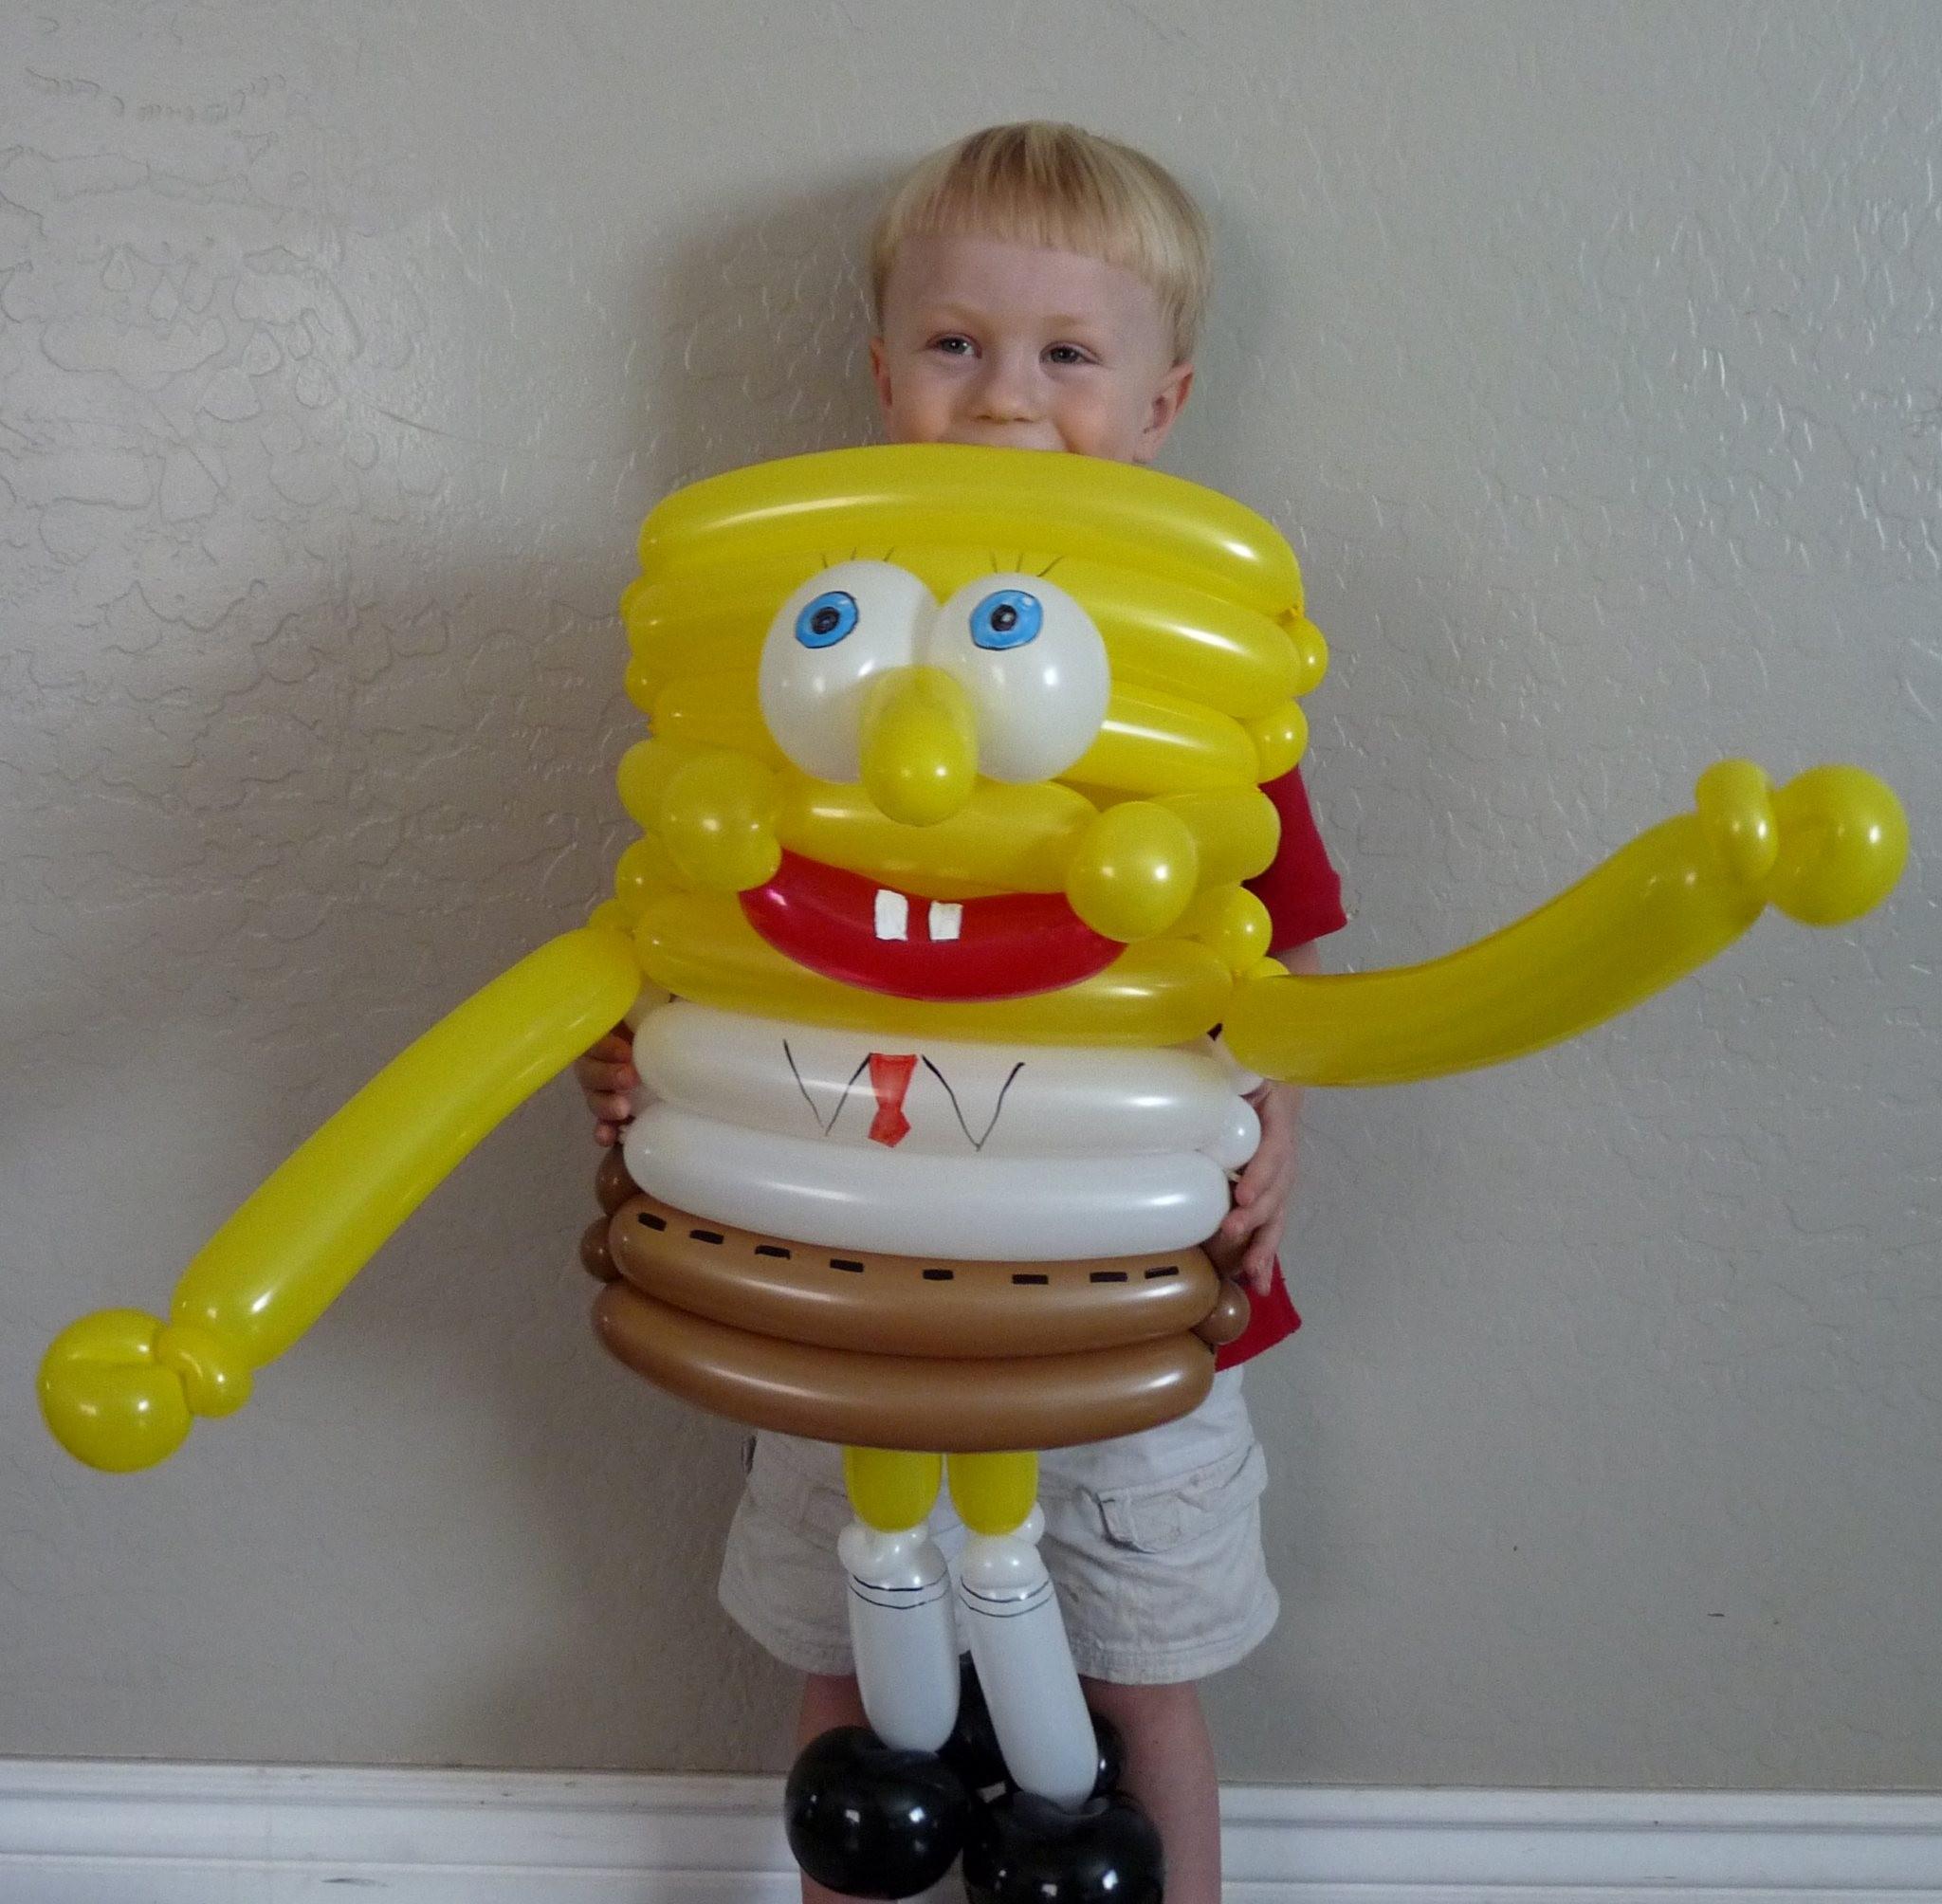 az balloon twisted spongebob - ایده هایی کارتونی برای تزیین بادکنک تولد